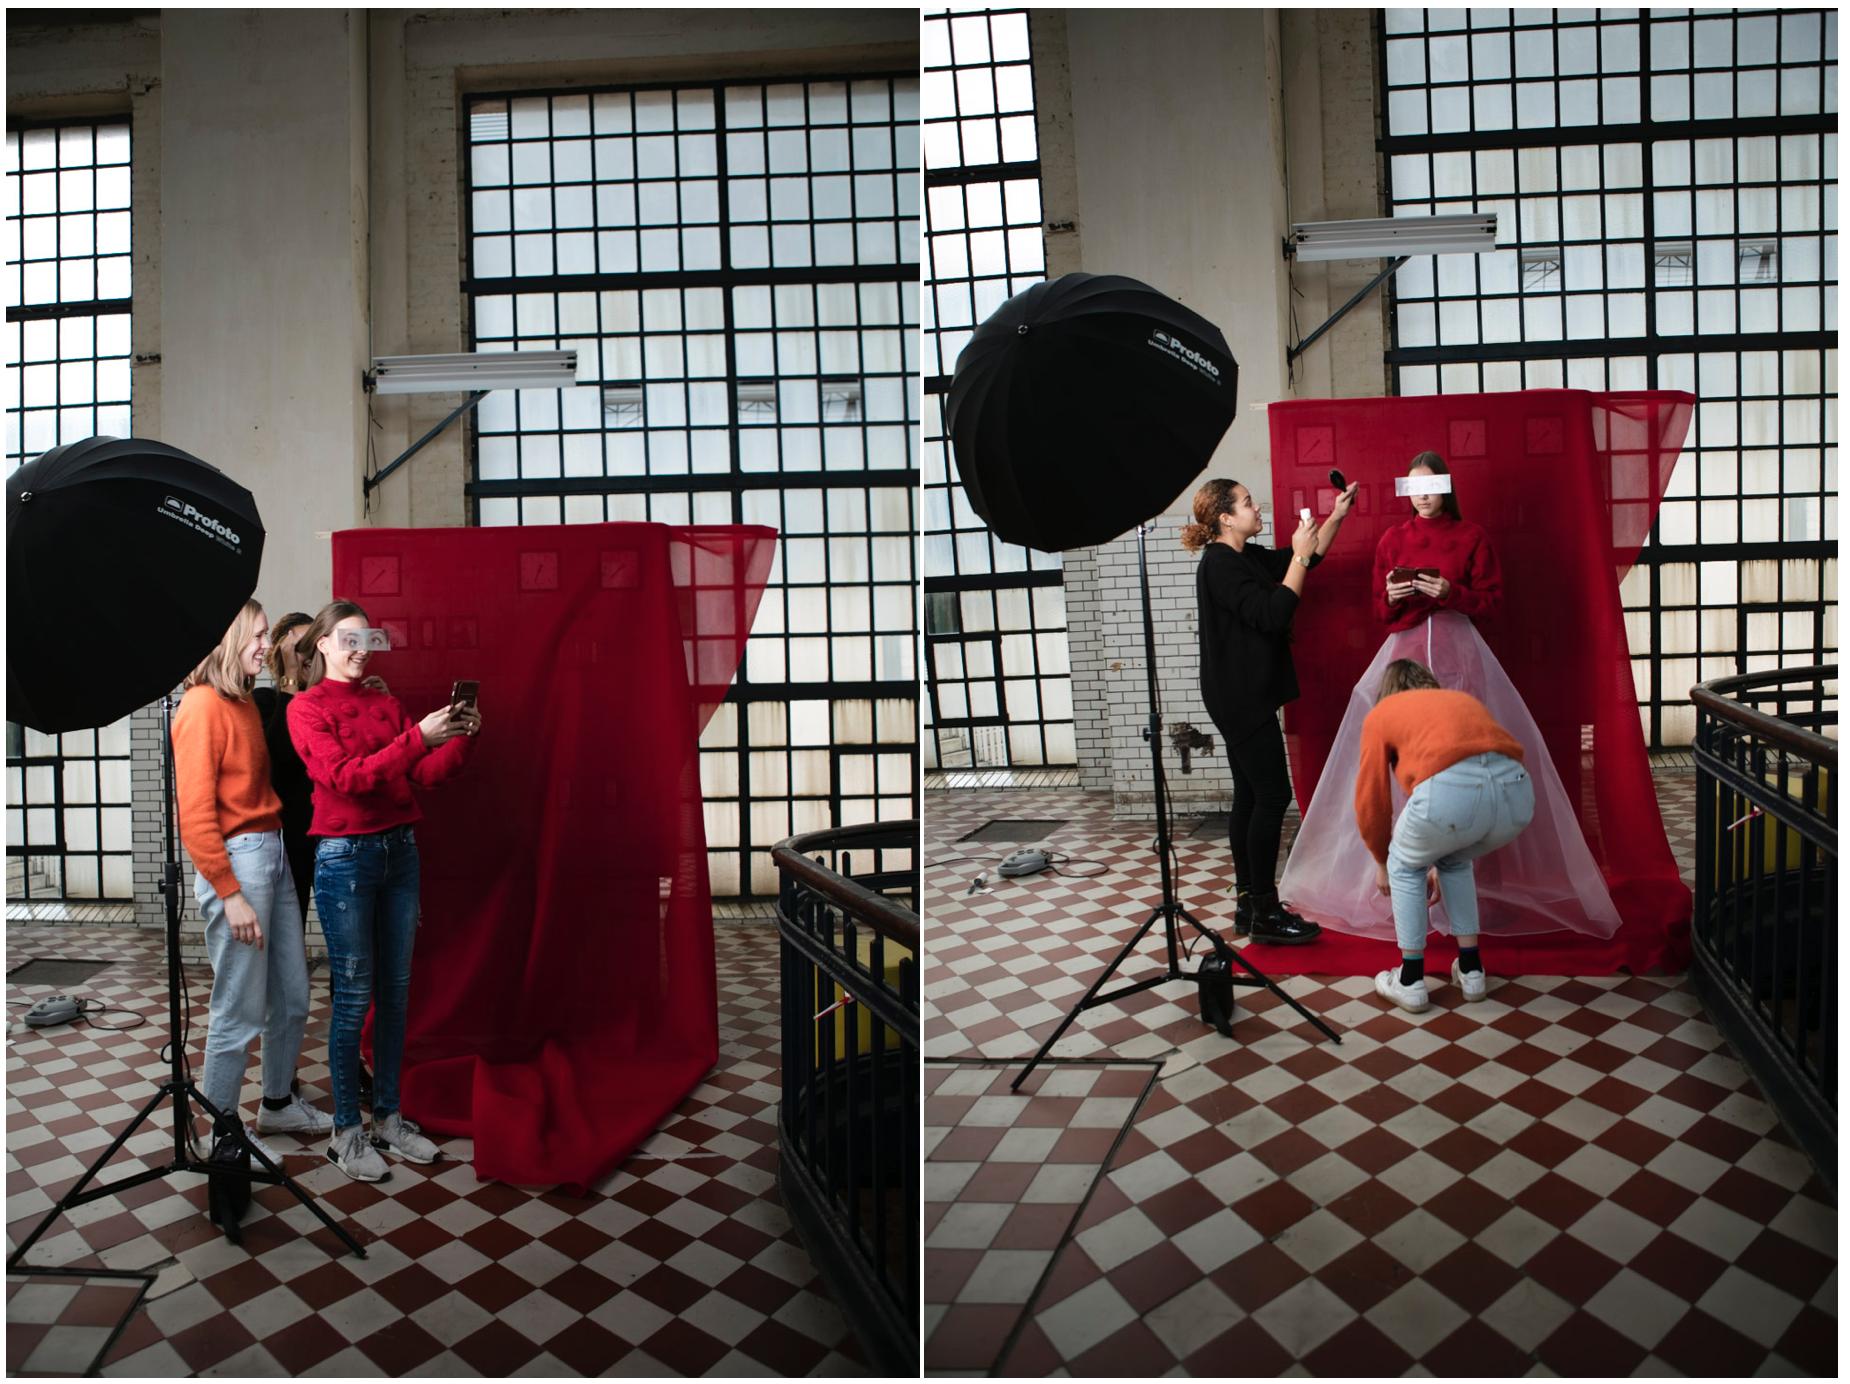 fotoshoot, backstage, behind the scenes, evely duis, fotoshoot, fotografie, fotostudio reusel, noord brabant, antwerpen, gent, fashion, mode, magazine